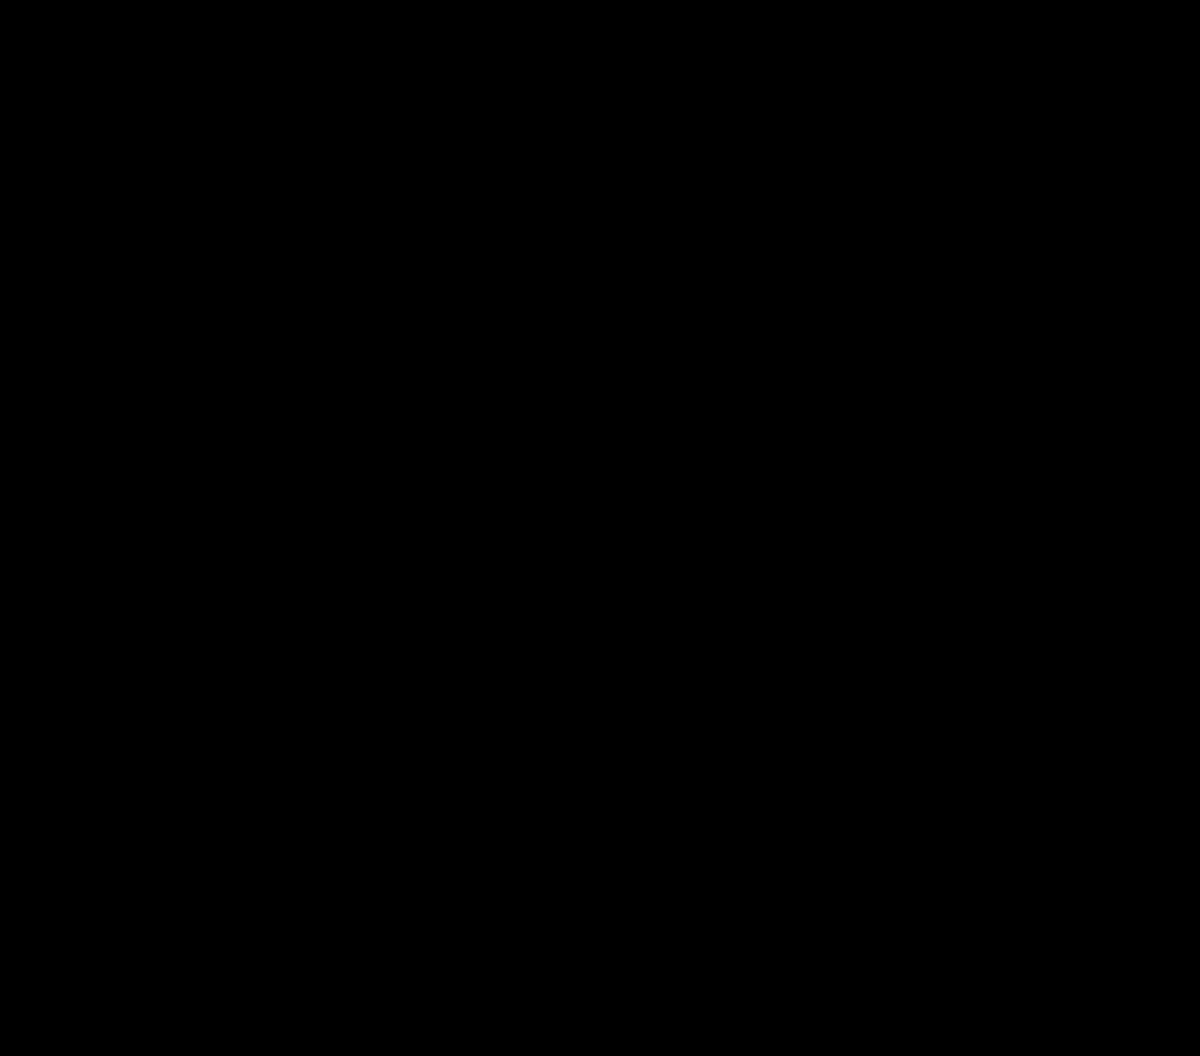 Zweetband met rits + gratis trainingsmasktrainingsmasker – Fietsen – Hardlopen – Fitnessen – Boksen / Kickboksen – Reizen – Activiteiten – wintersport – Sporten, (pols portemonnee) – Training masker